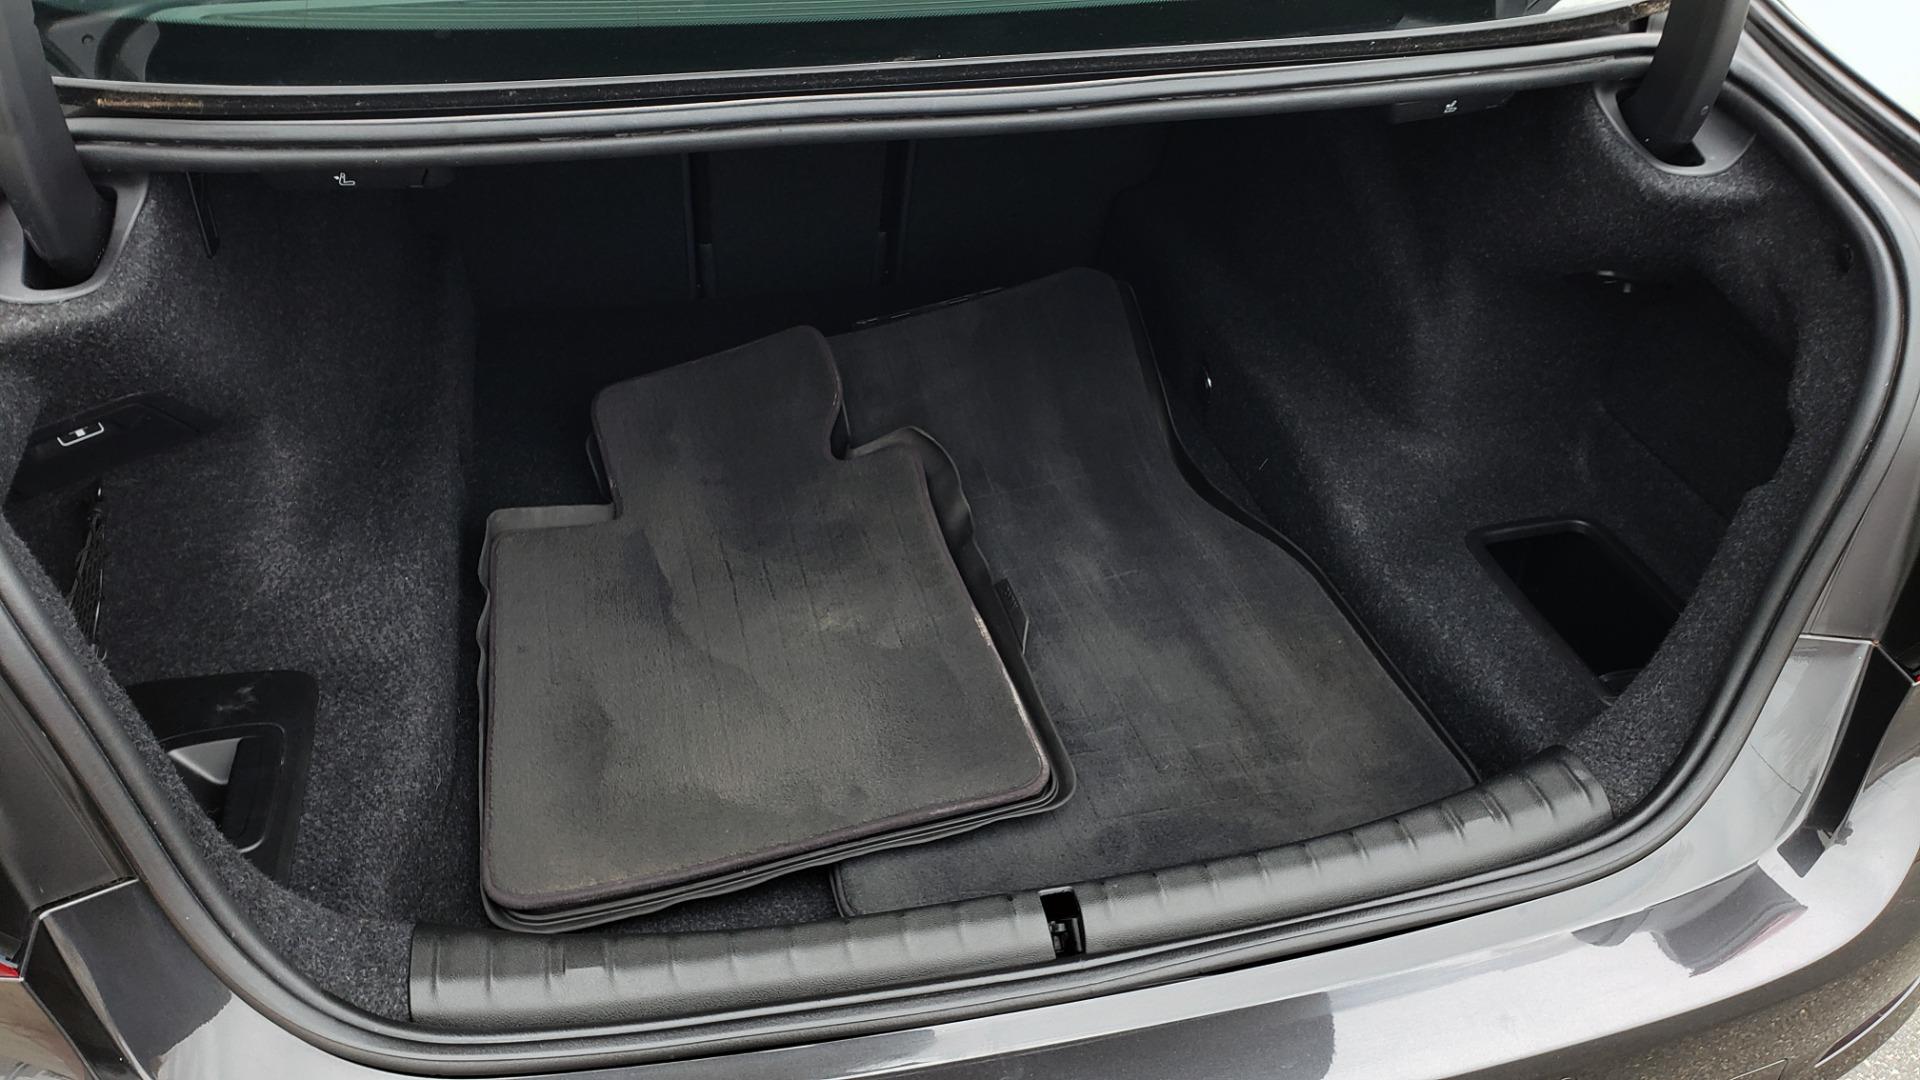 Used 2017 BMW 5 SERIES 530IXDRIVE / PREM PKG / DRVR ASST PLUS / CLD WTHR / APPLE CARPLAY for sale Sold at Formula Imports in Charlotte NC 28227 13